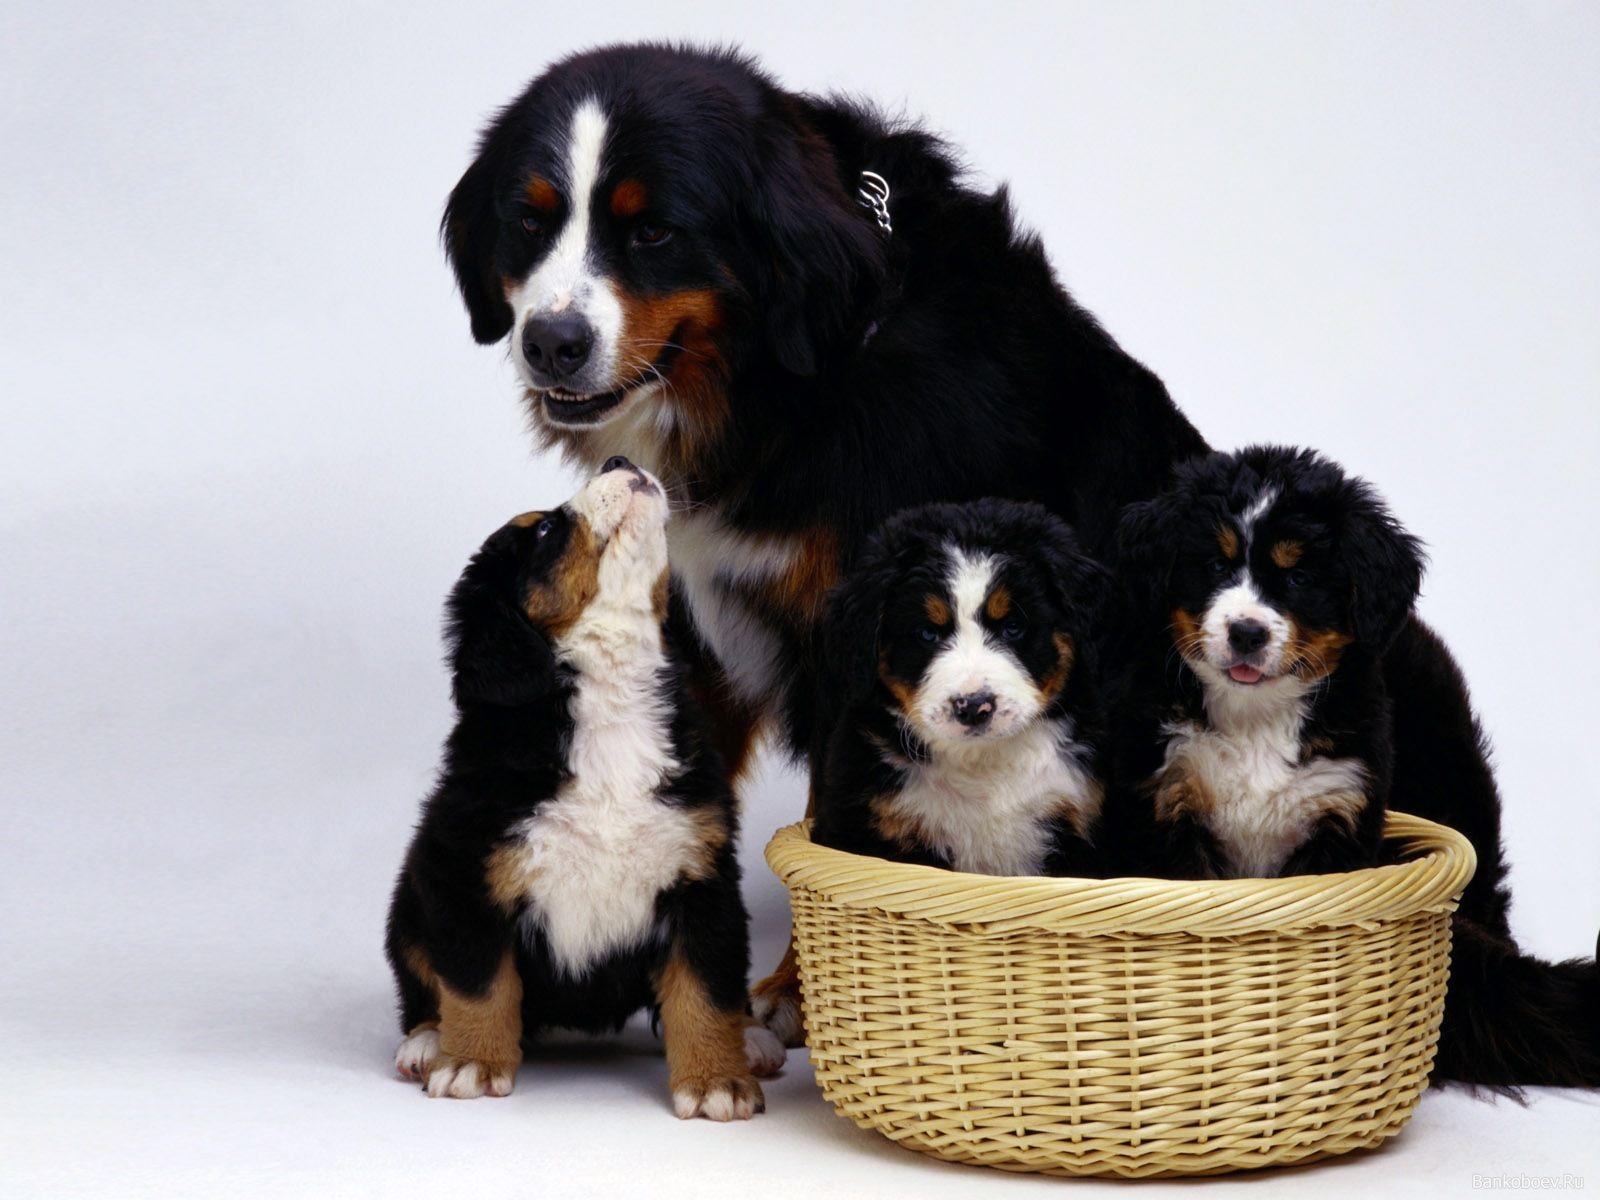 original wallpaper download family bernese mountain dog